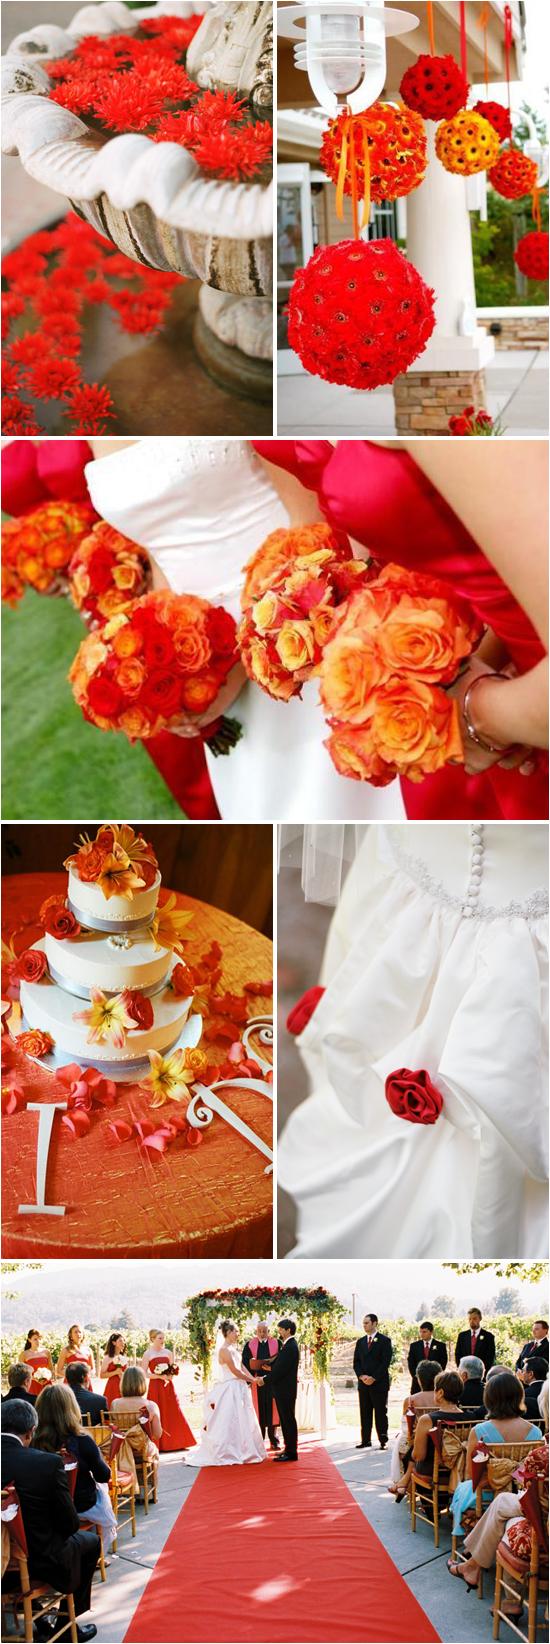 http://www.projectwedding.com/blog/category/color-palettes/